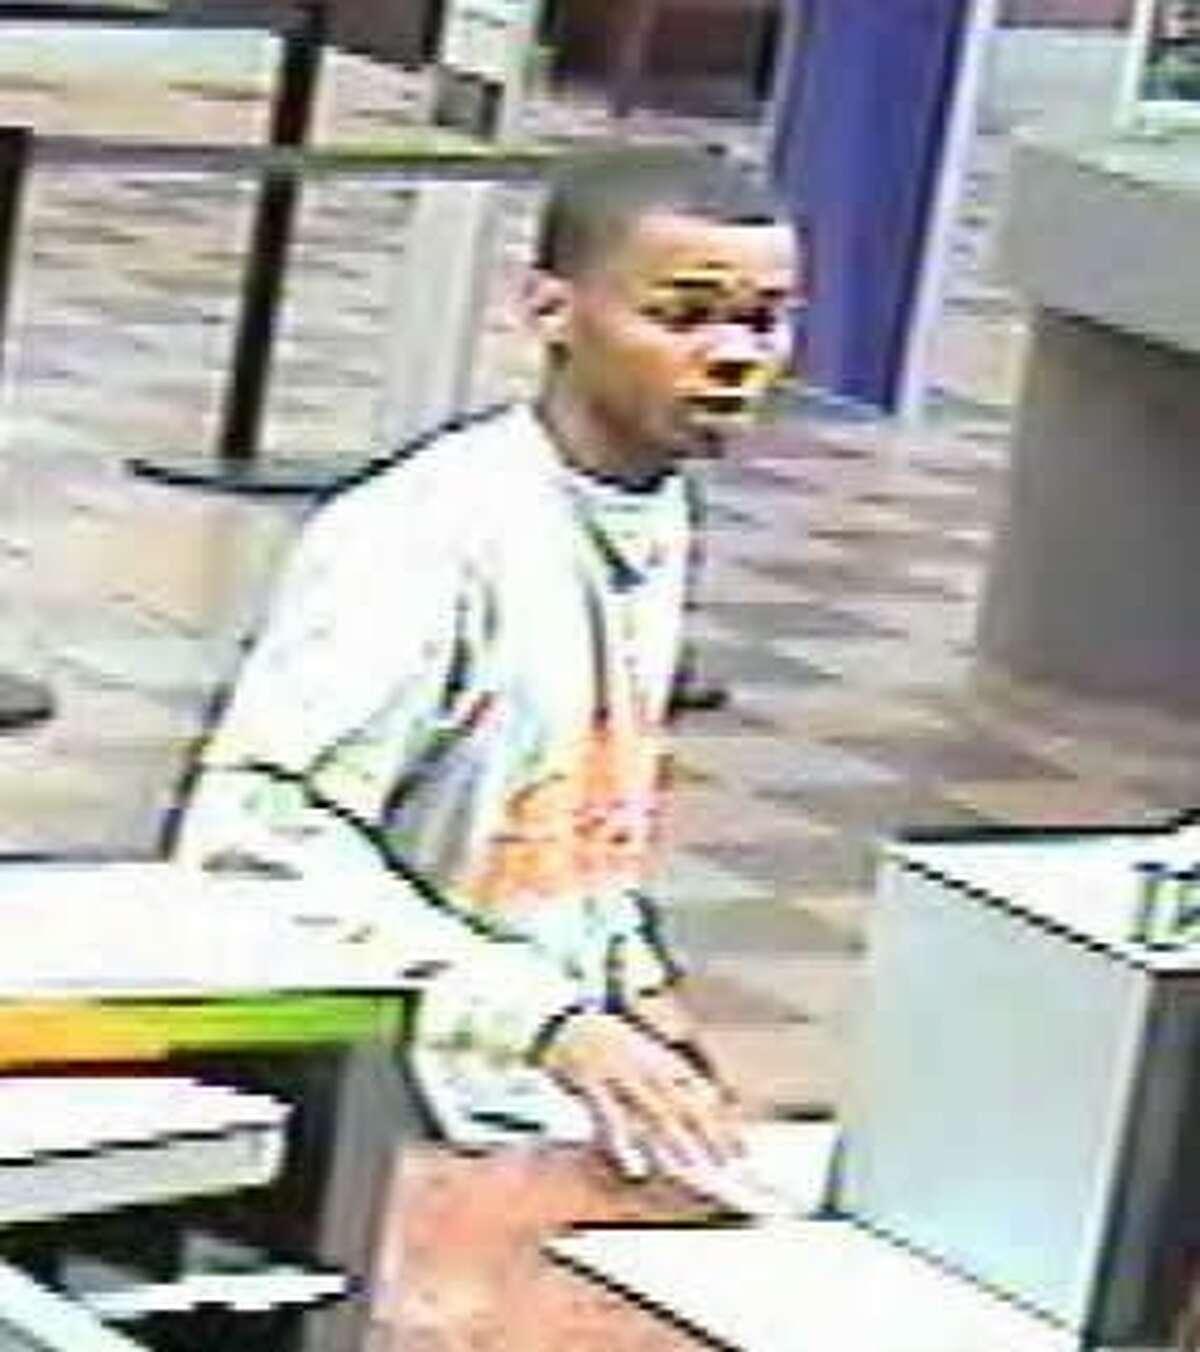 Bank surveillance photo of one suspect.